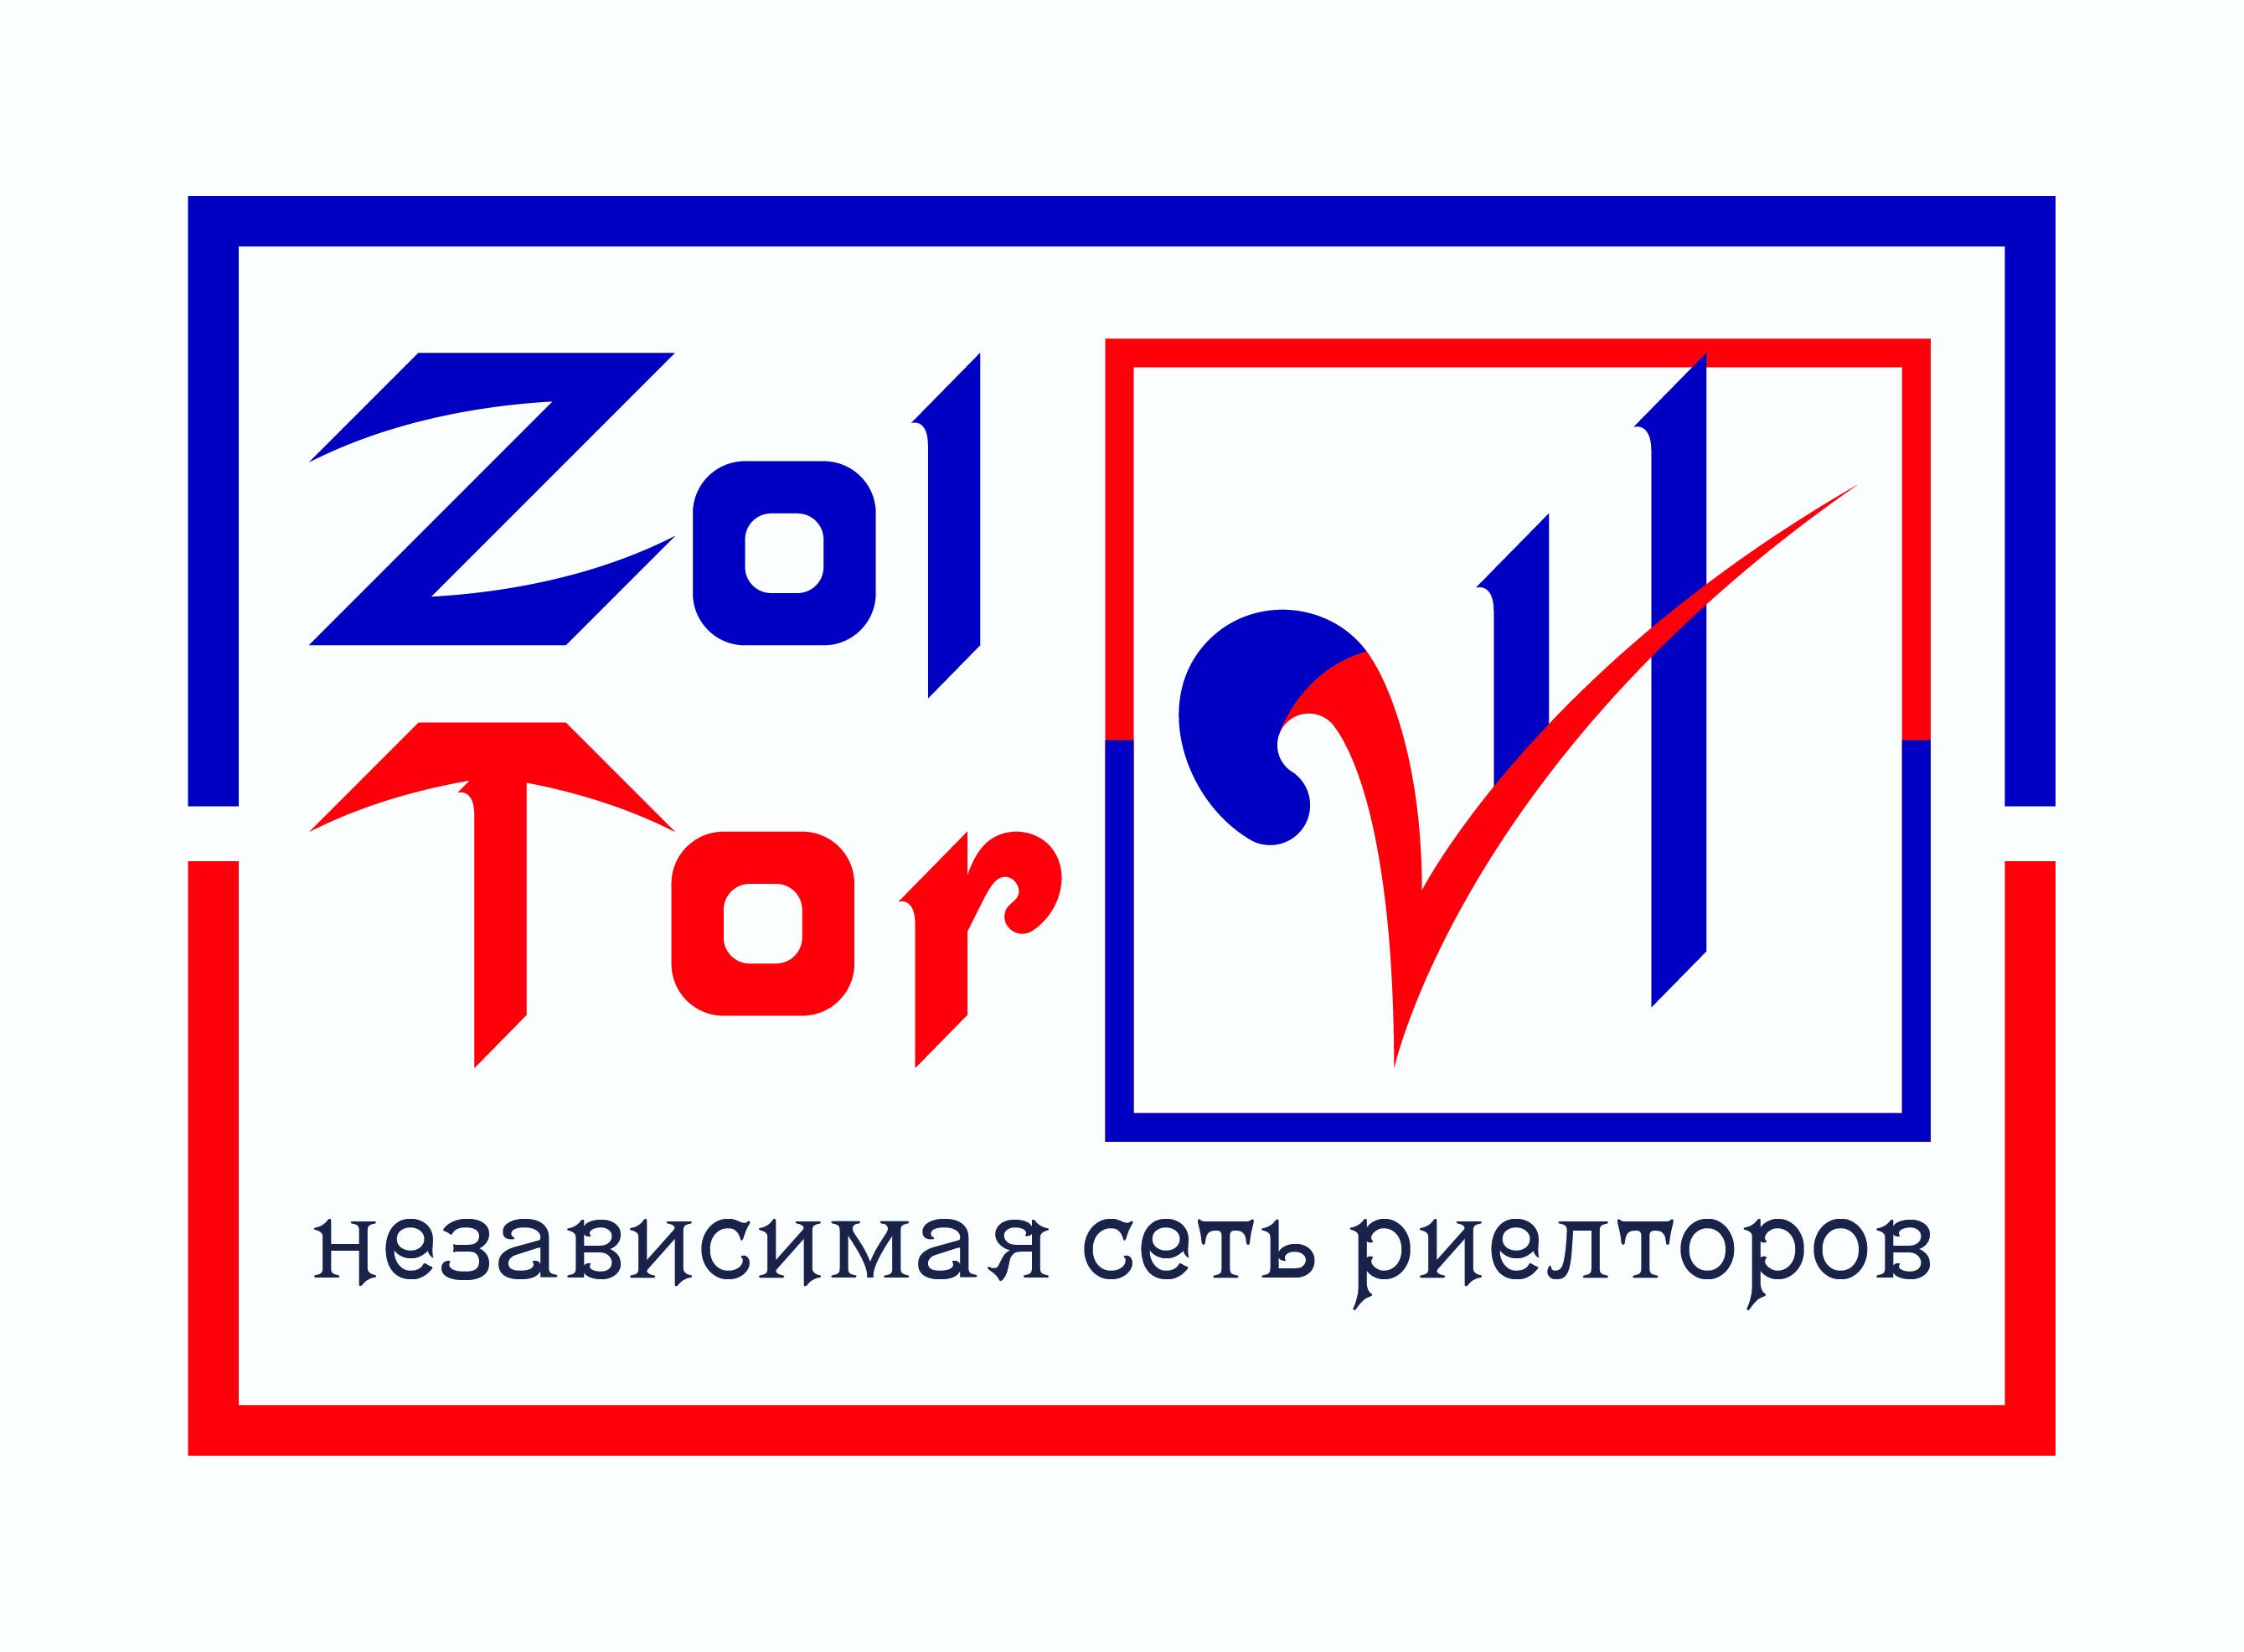 Логотип и фирменный стиль ZolTor24 фото f_6025c89738e9c987.jpg